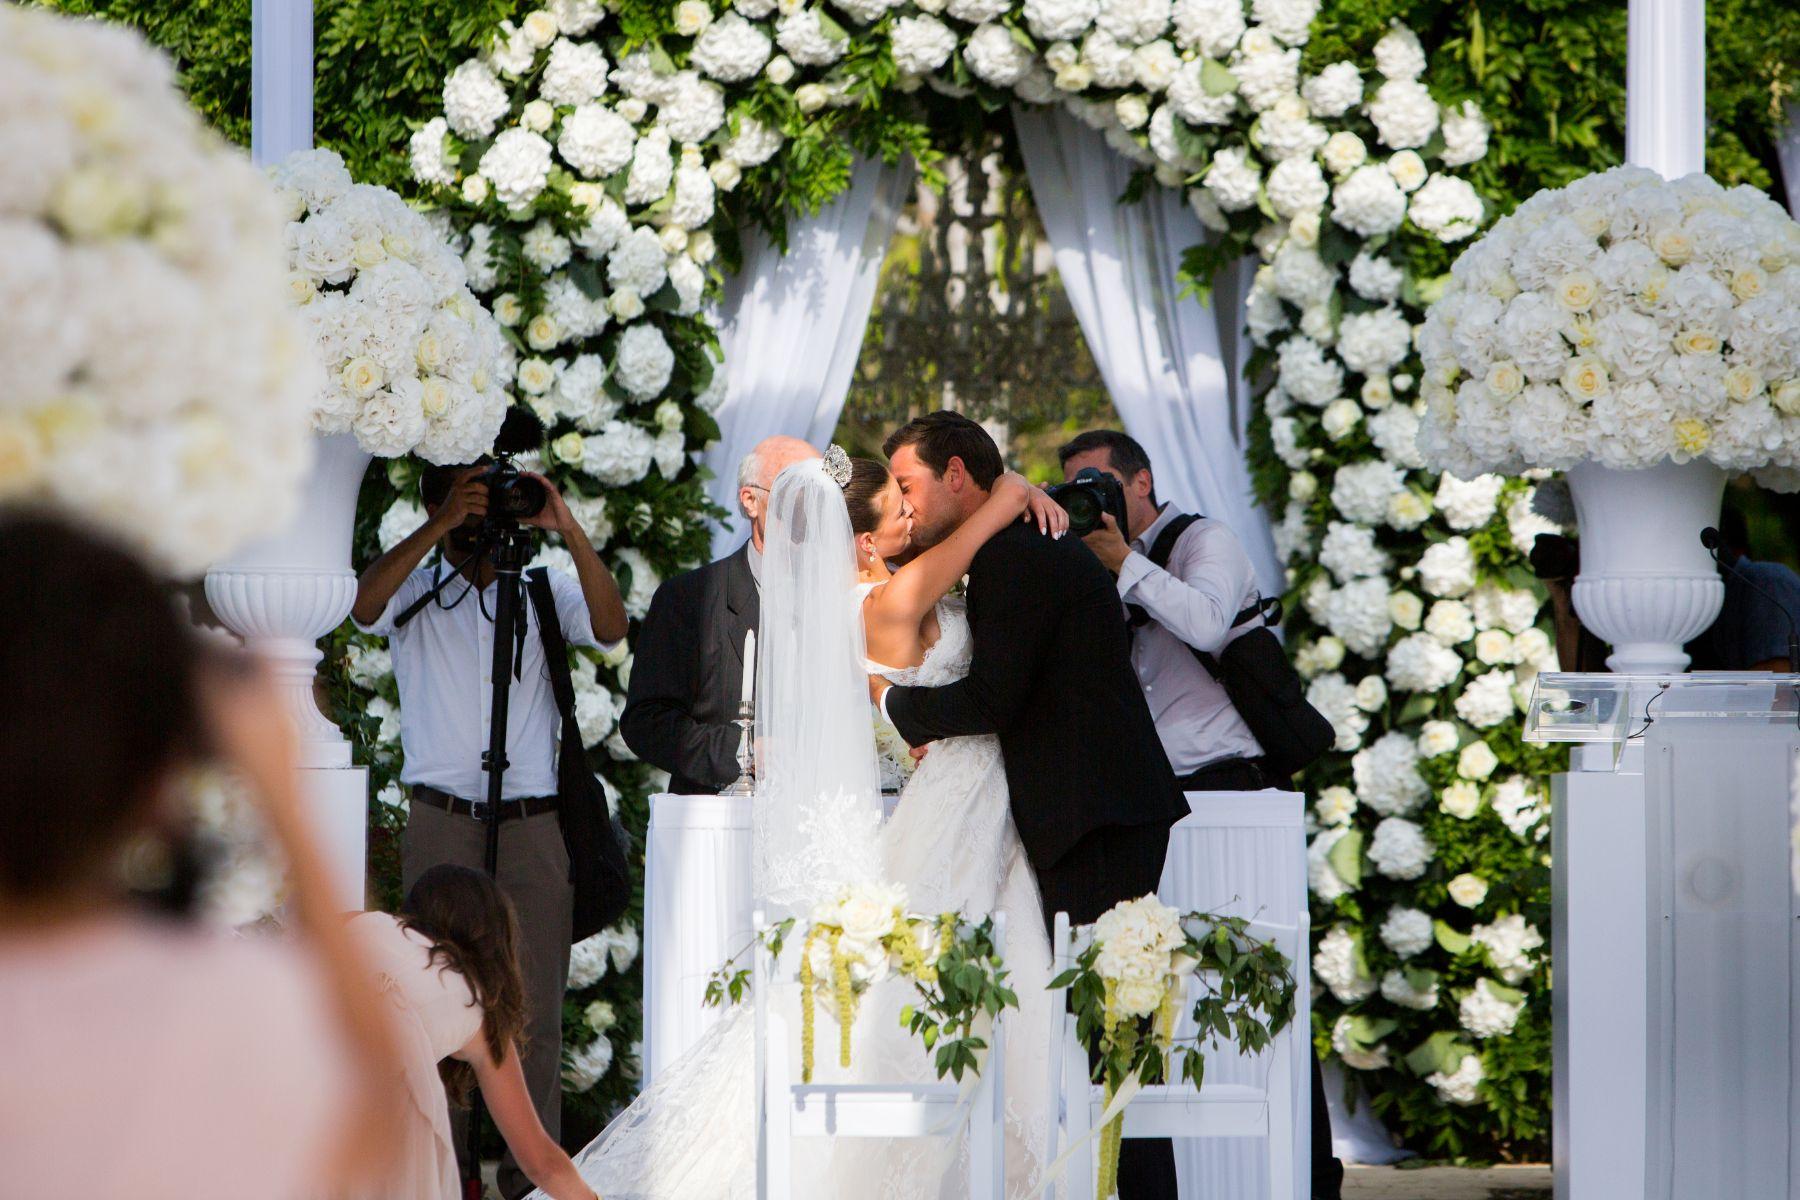 Bride and groom embracing following wedding.